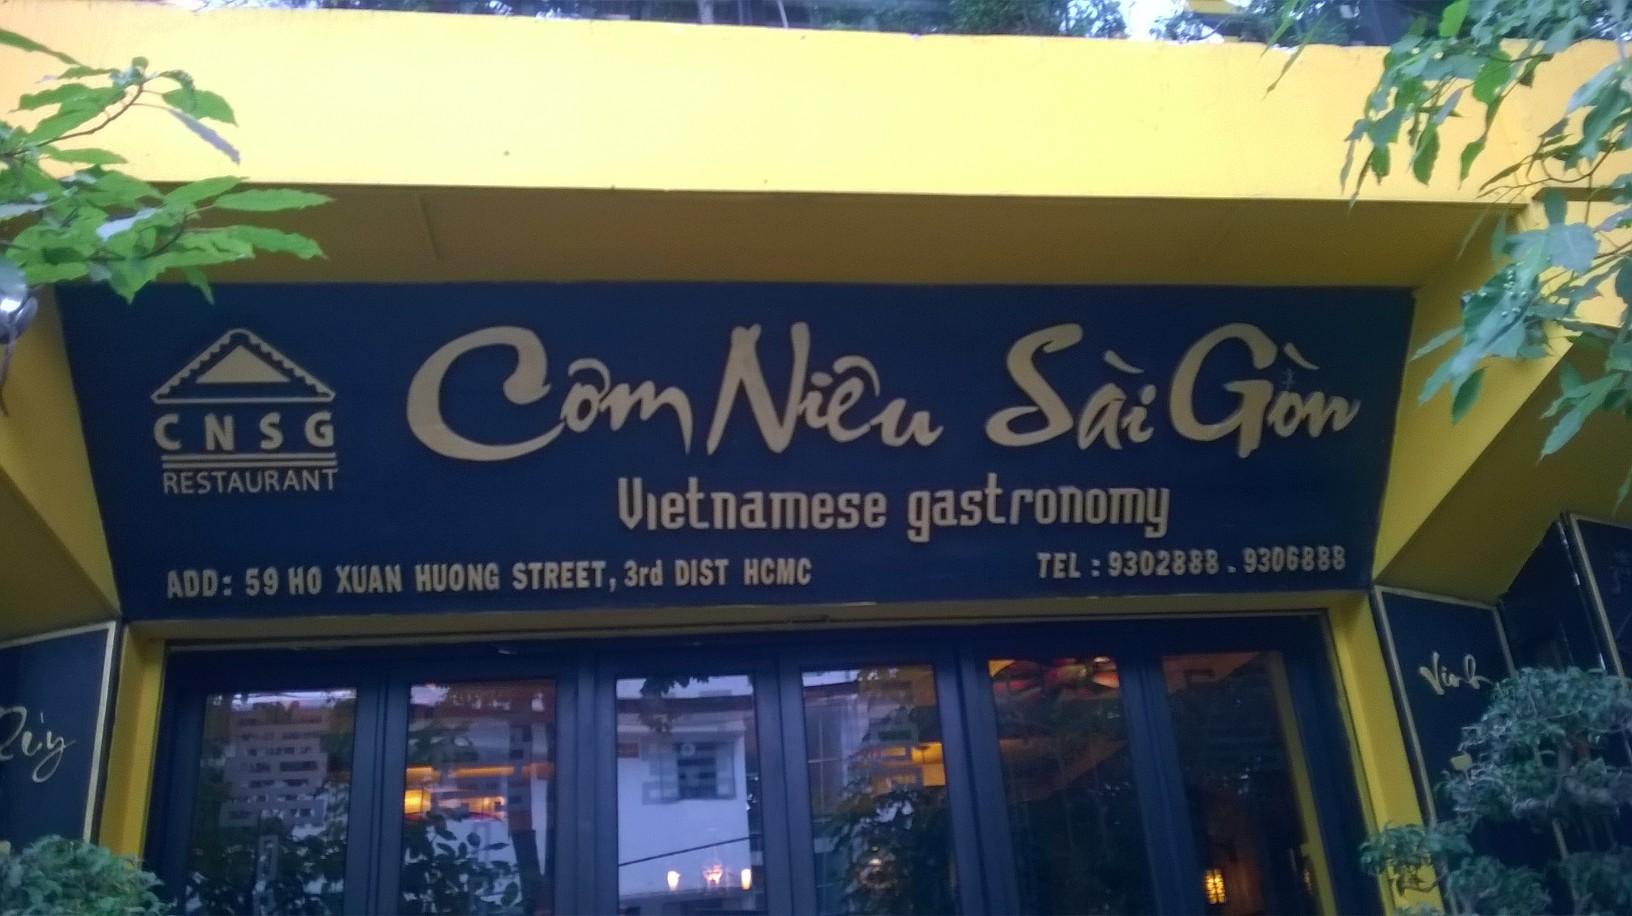 hcmc-com-nieu-sai-gon-resto-entrance-mar16